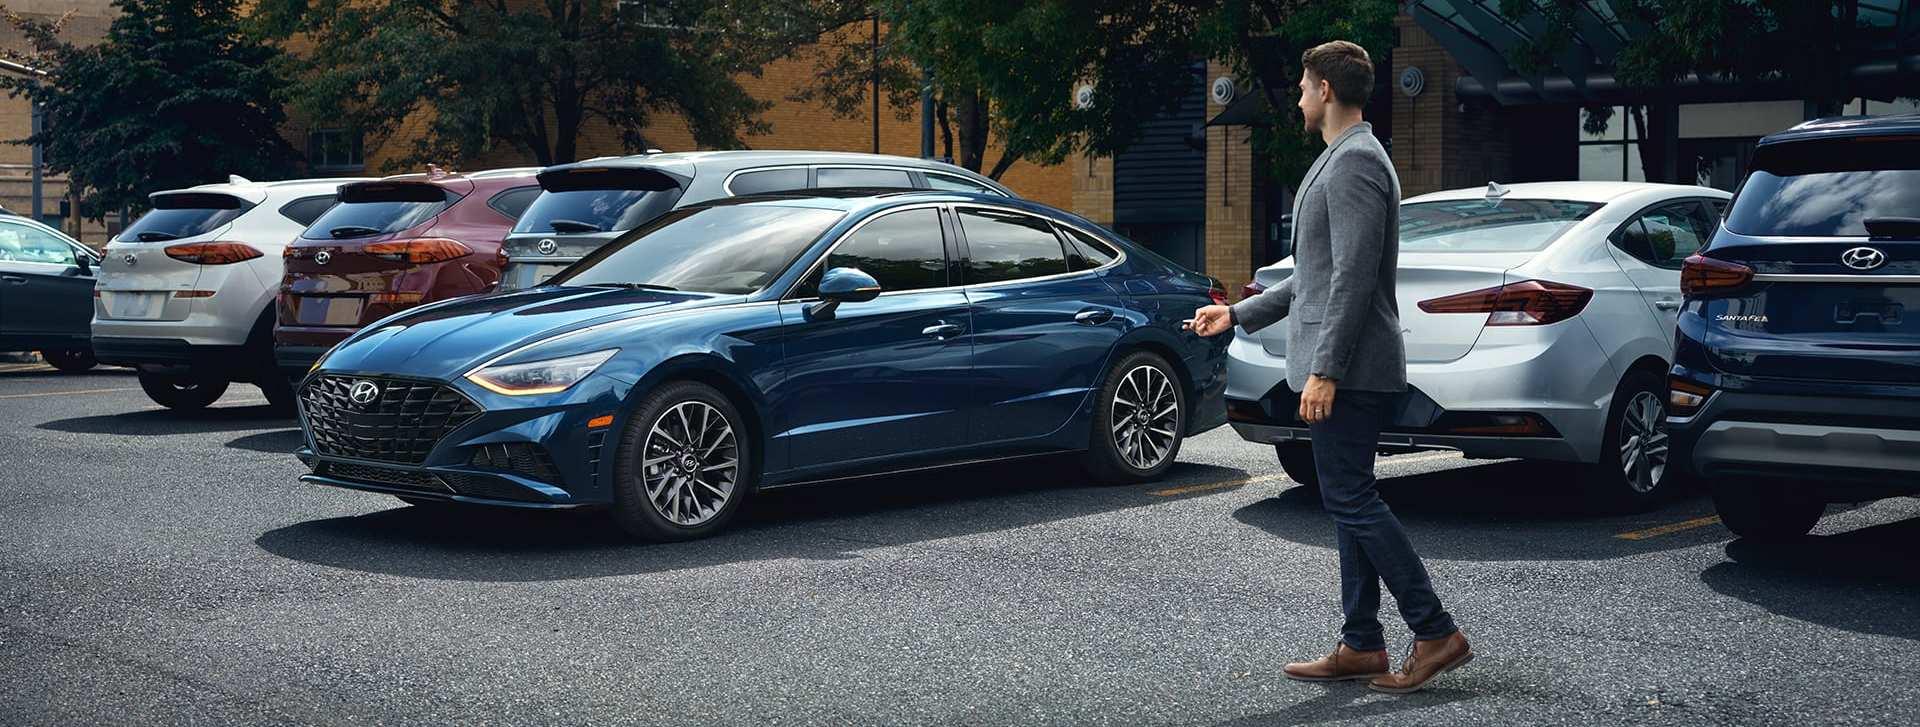 2020 Hyundai Sonata Leasing near Washington, DC